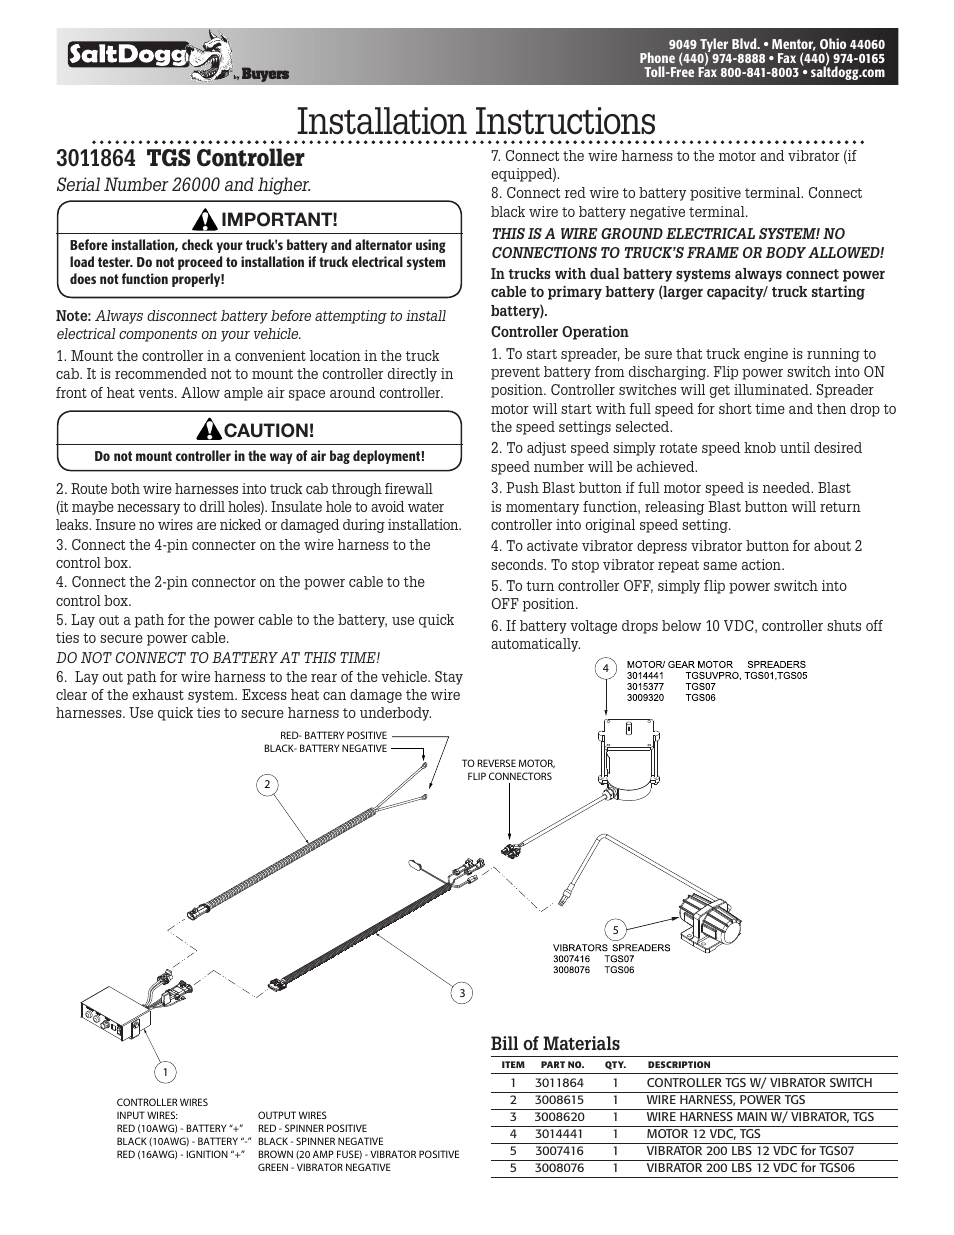 medium resolution of saltdogg tgs controller 3011864 tgsuvproa tgs01b tgs03 tgs05b western spreader wiring schematic salt dogg wiring diagram